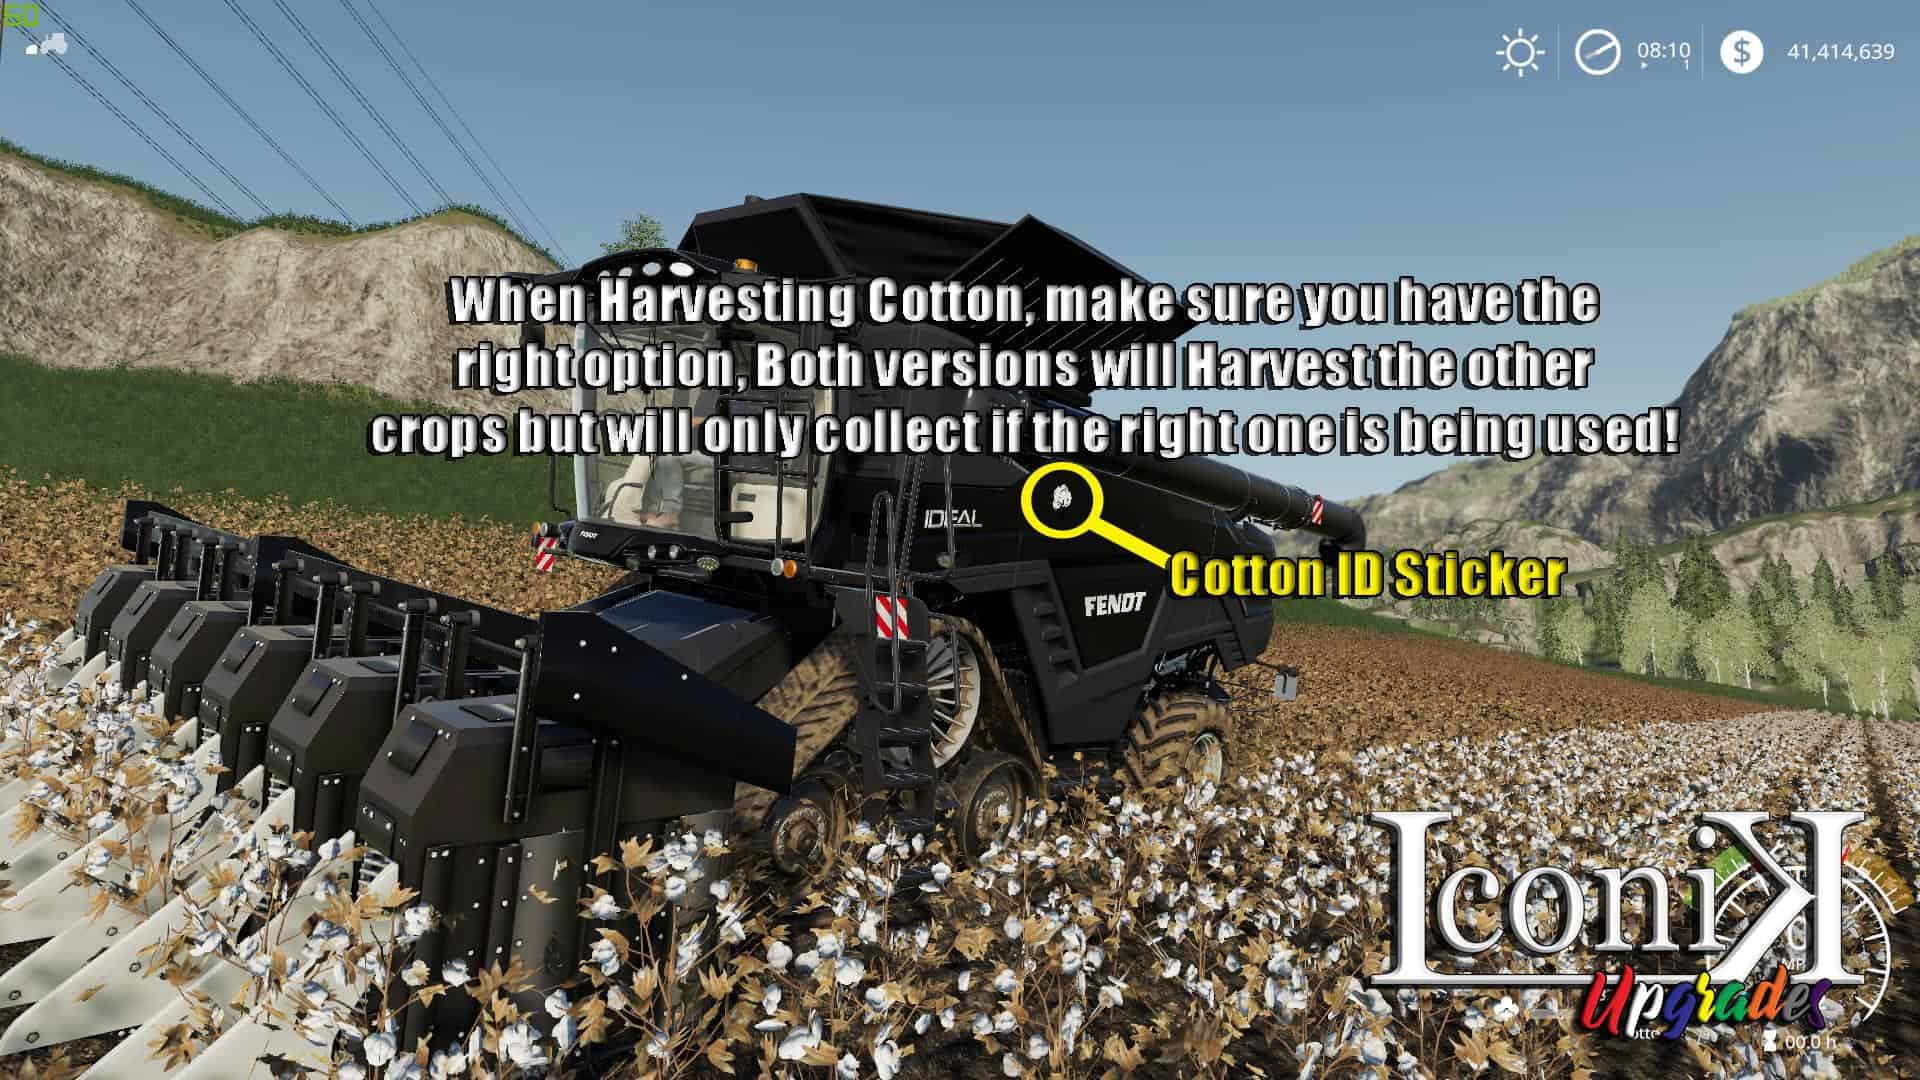 Iconik Ideal Harvester v1 0 Mod - Farming Simulator 19 Mod / FS19